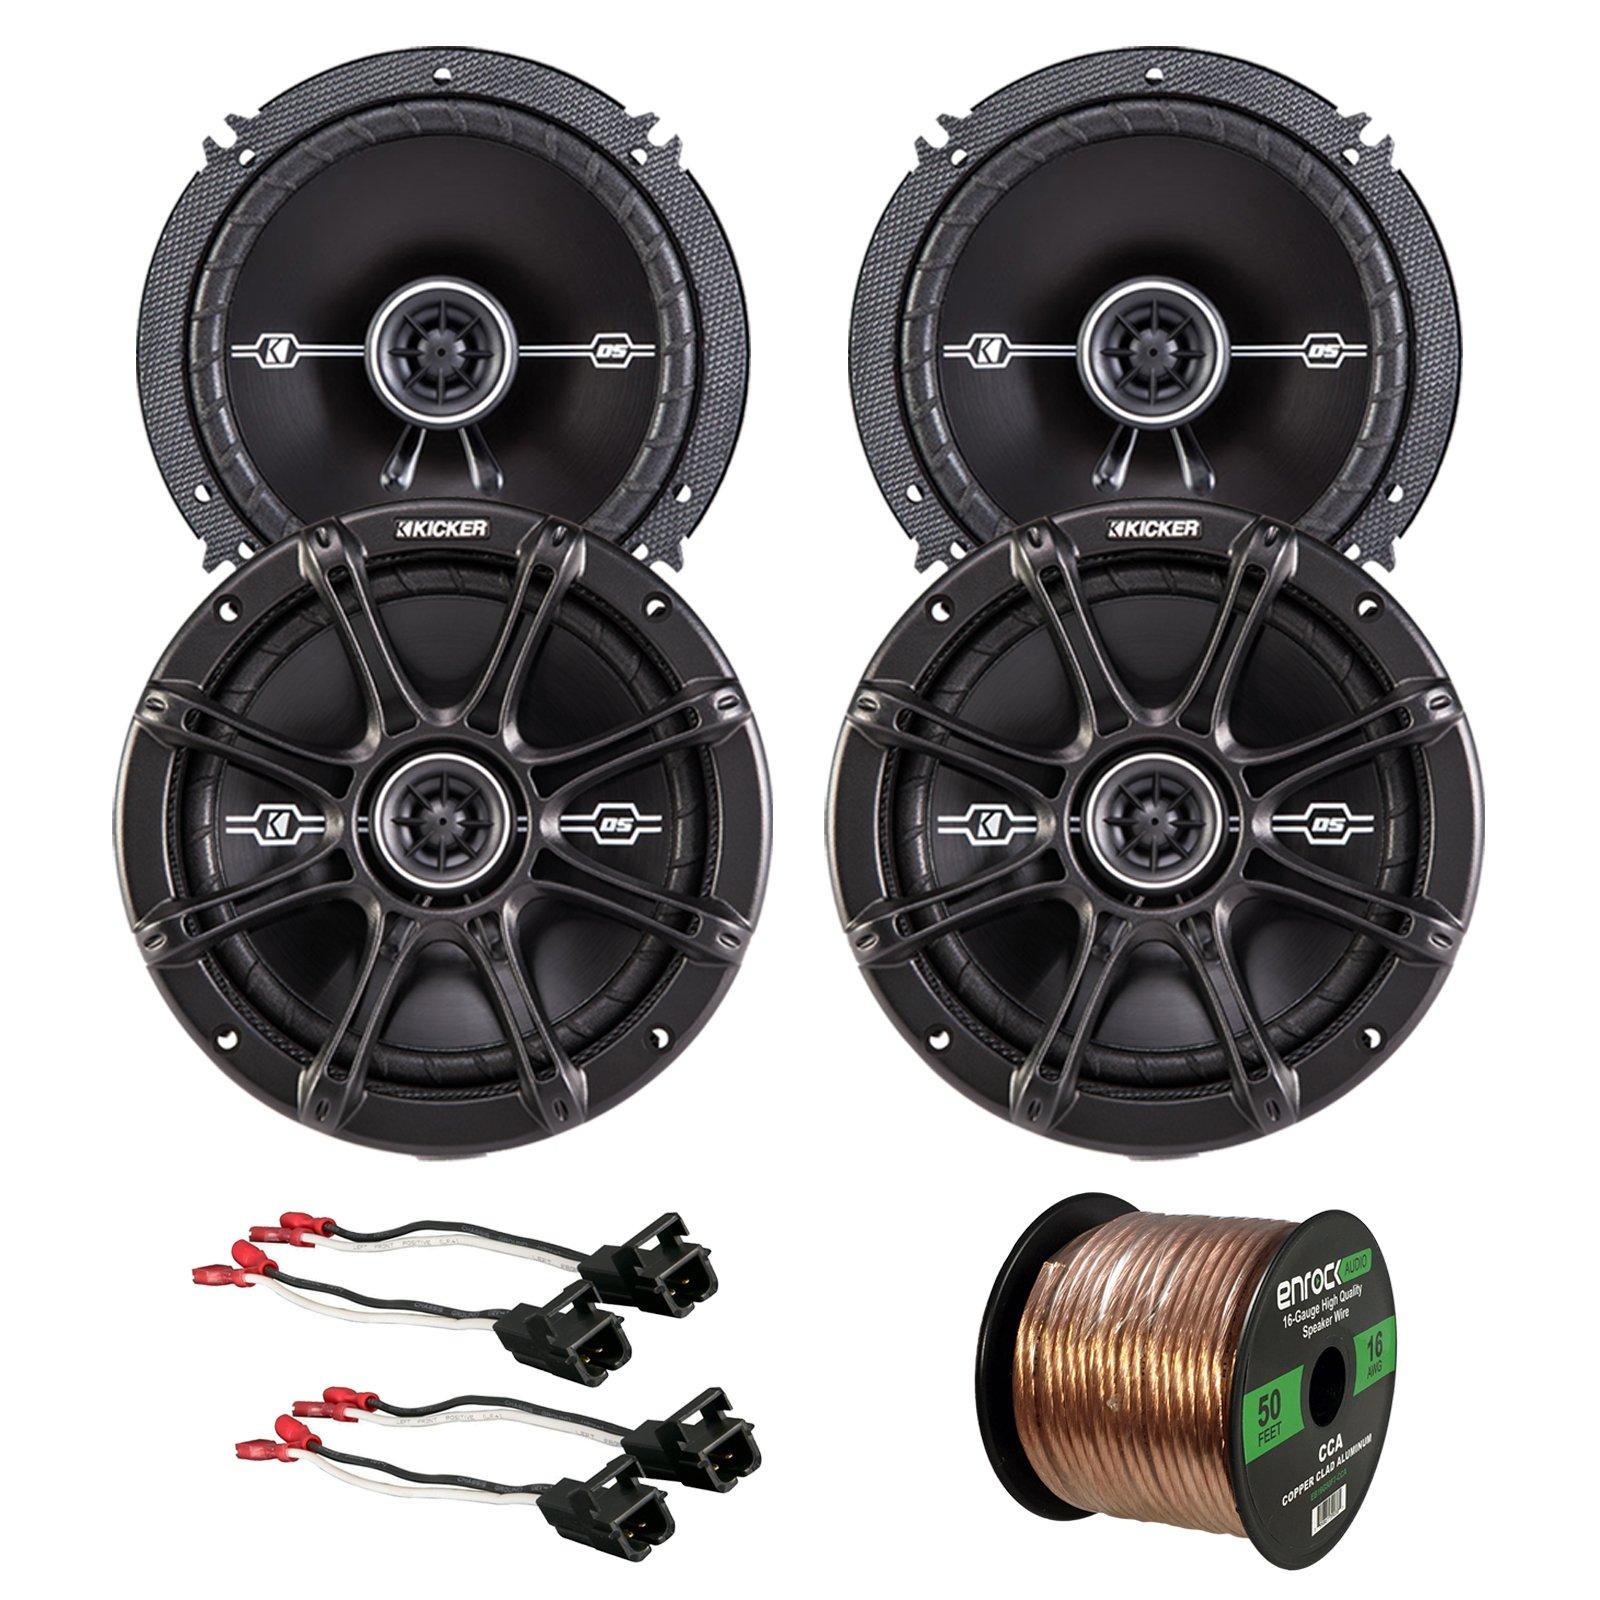 Car Speaker Bundle Combo: 2 Pairs of Kicker 43DSC6504 6.5'' Inch 480 Watts 2-Way D-Series Black Car Stereo Coaxial Speaker + Metra Speaker Wiring Harness + Enrock 50 Foot 16 Gauge Speaker Wire